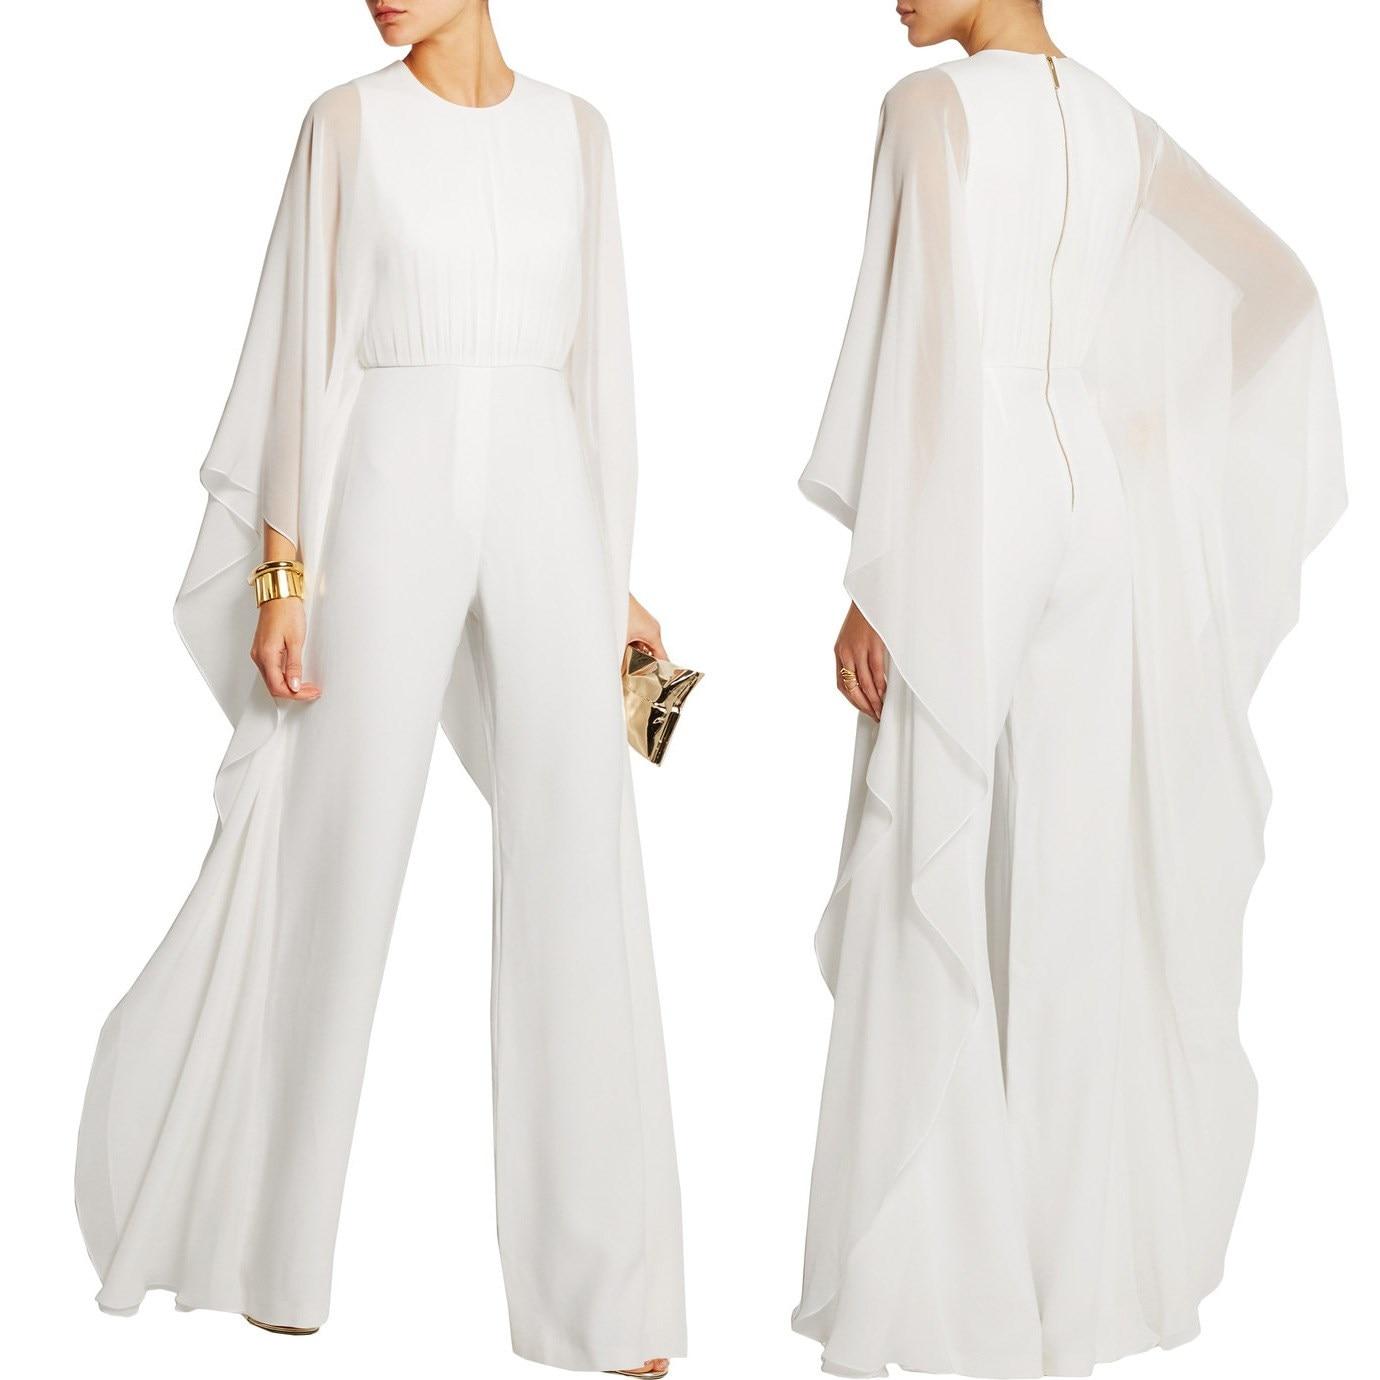 Hot Summer Women Ruffles Casual Fashion Business Jumpsuit Office Ladies Solid Wide Legs Loose Jumpsuits Chiffon Elegant Romper